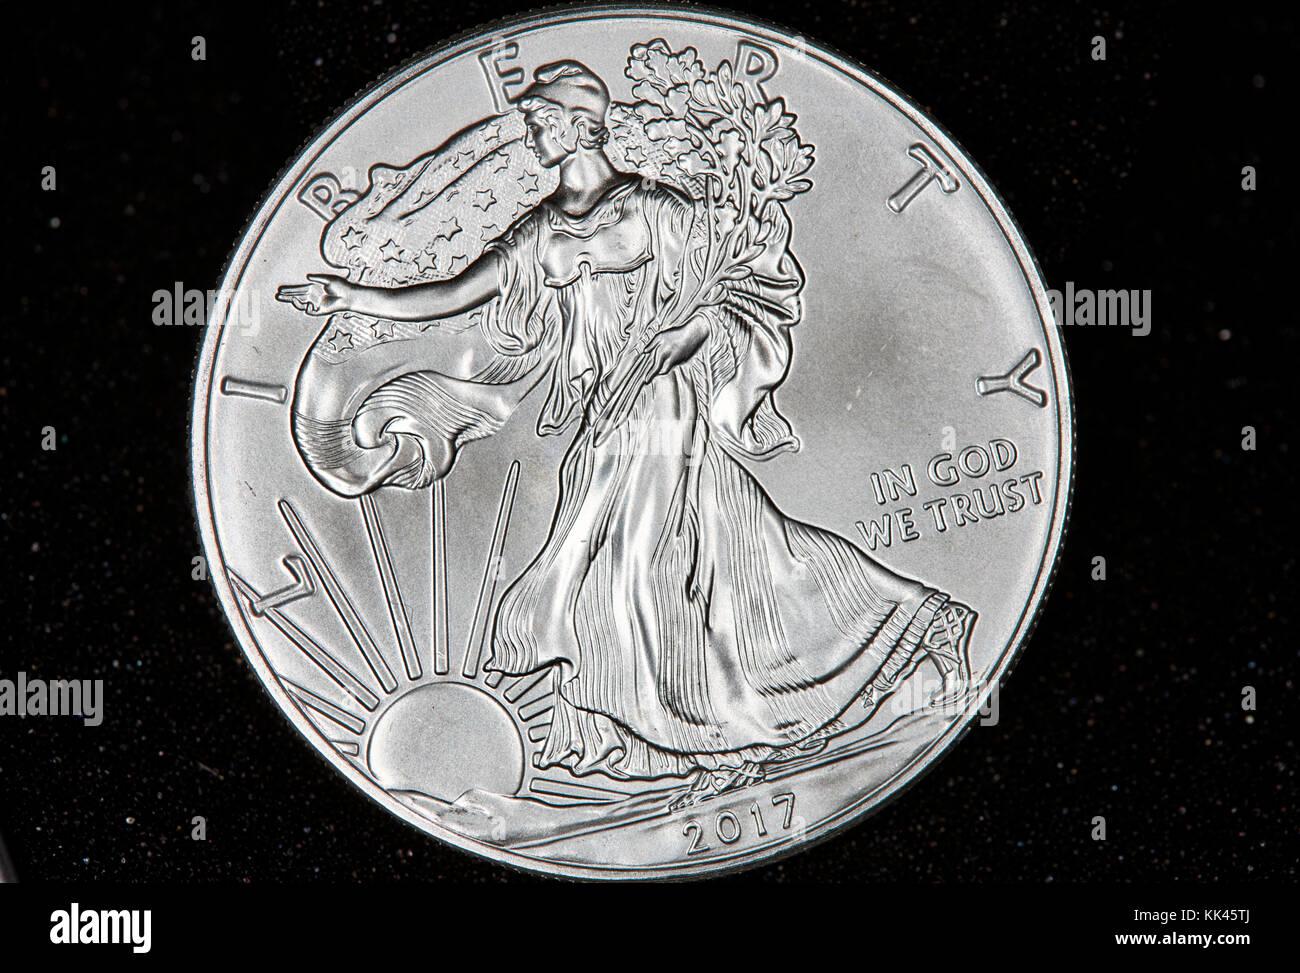 united states silver eagle 1oz bullion coin - Stock Image